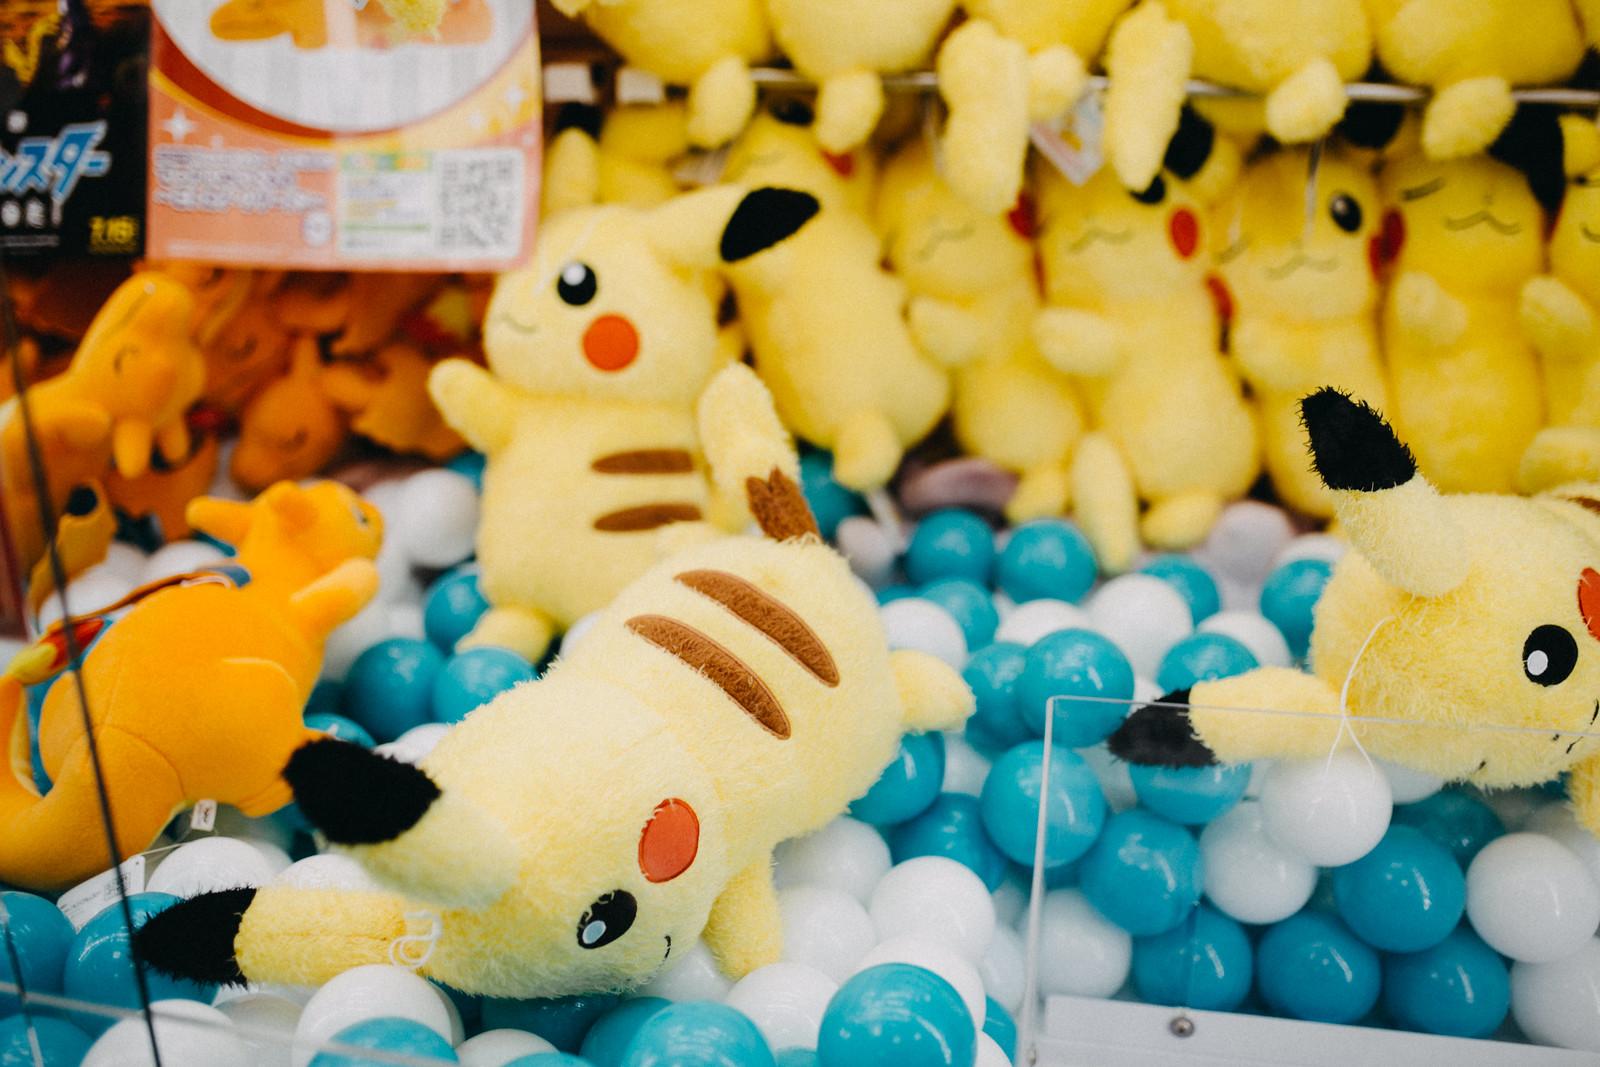 Stuffed pikachu in akihabara arcade in tokyo japan